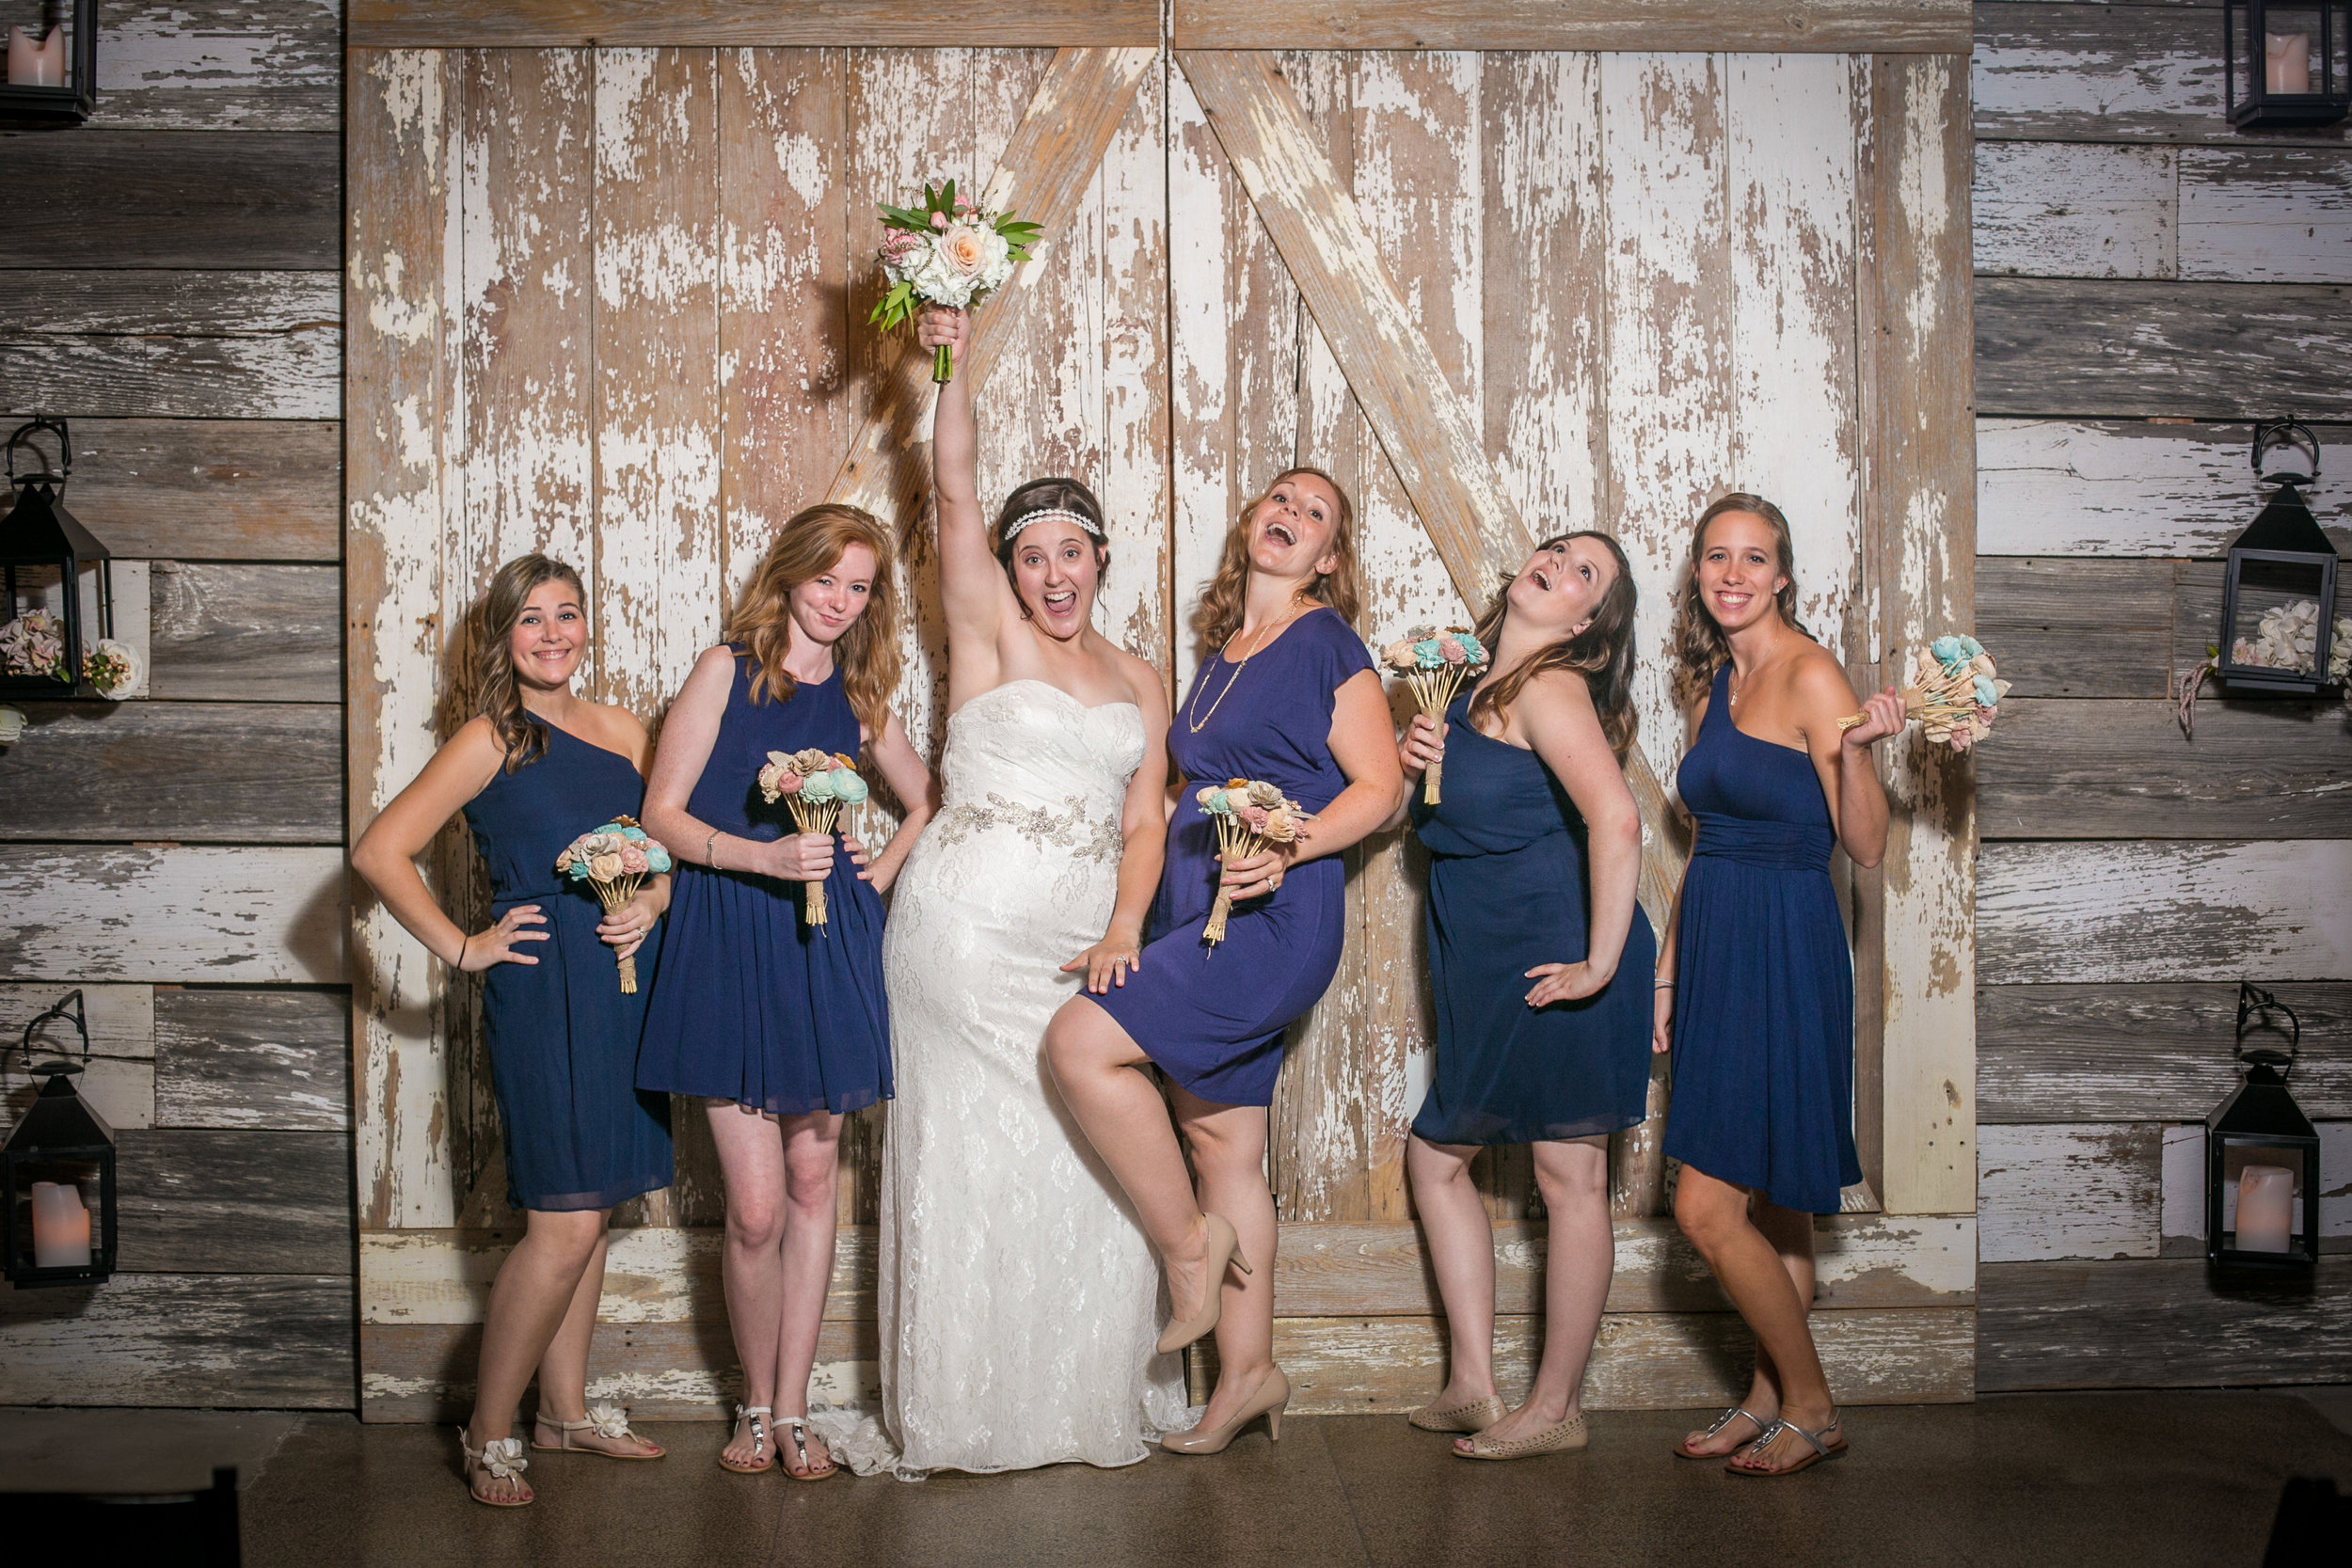 Kansas+City_Small+Wedding_Elope_Intimate_Ceremony_Best+Friends_13.jpg